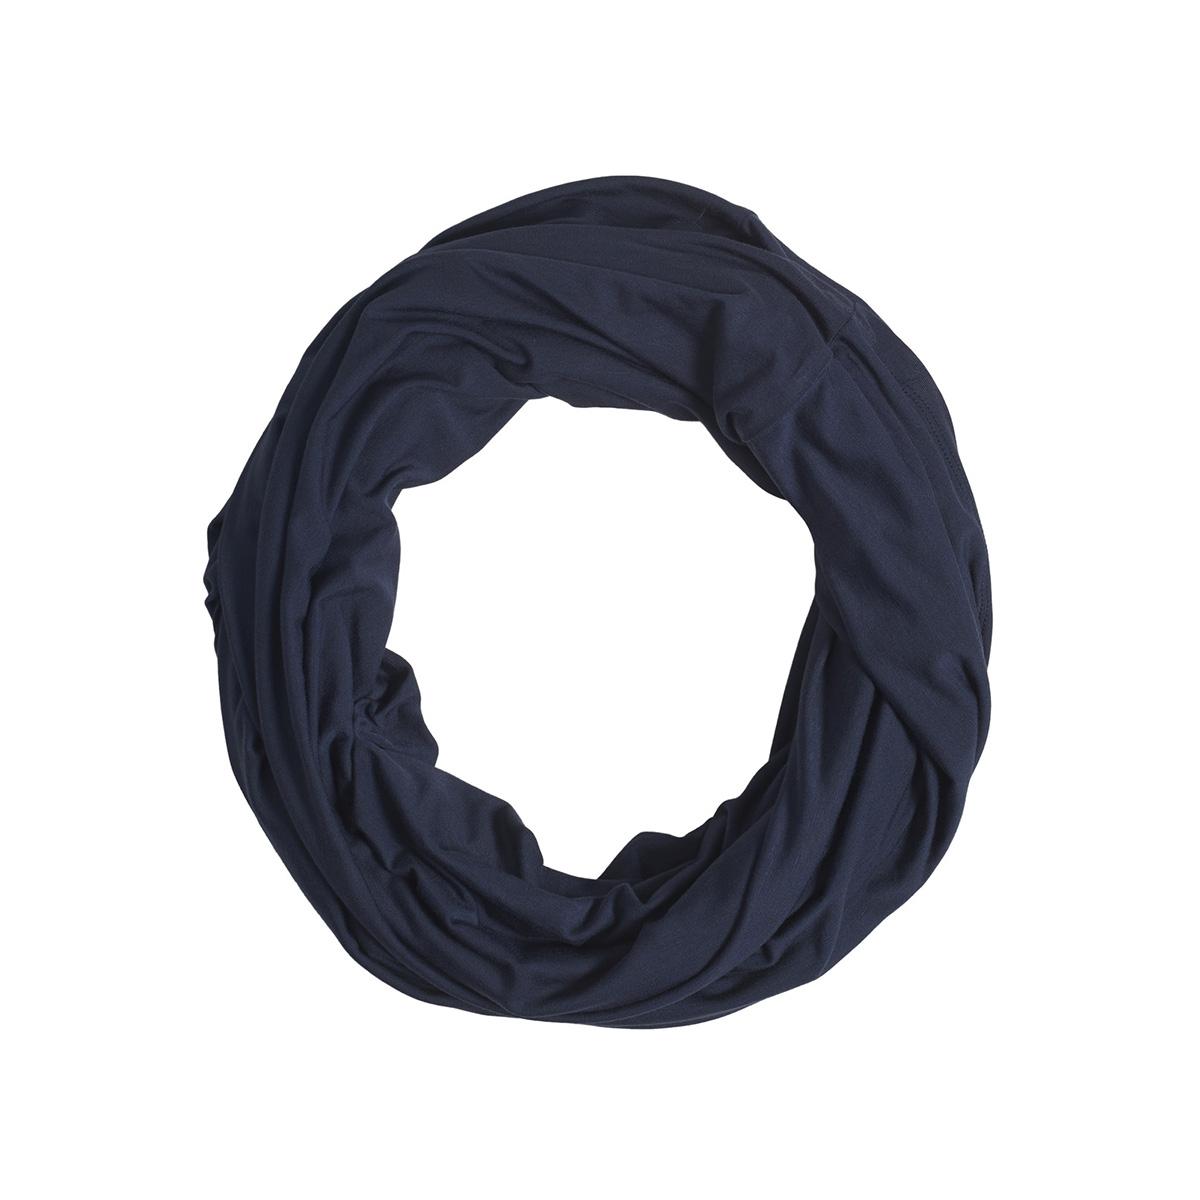 mlnursing jersey scarf 20007981 mama-licious  navy blazer